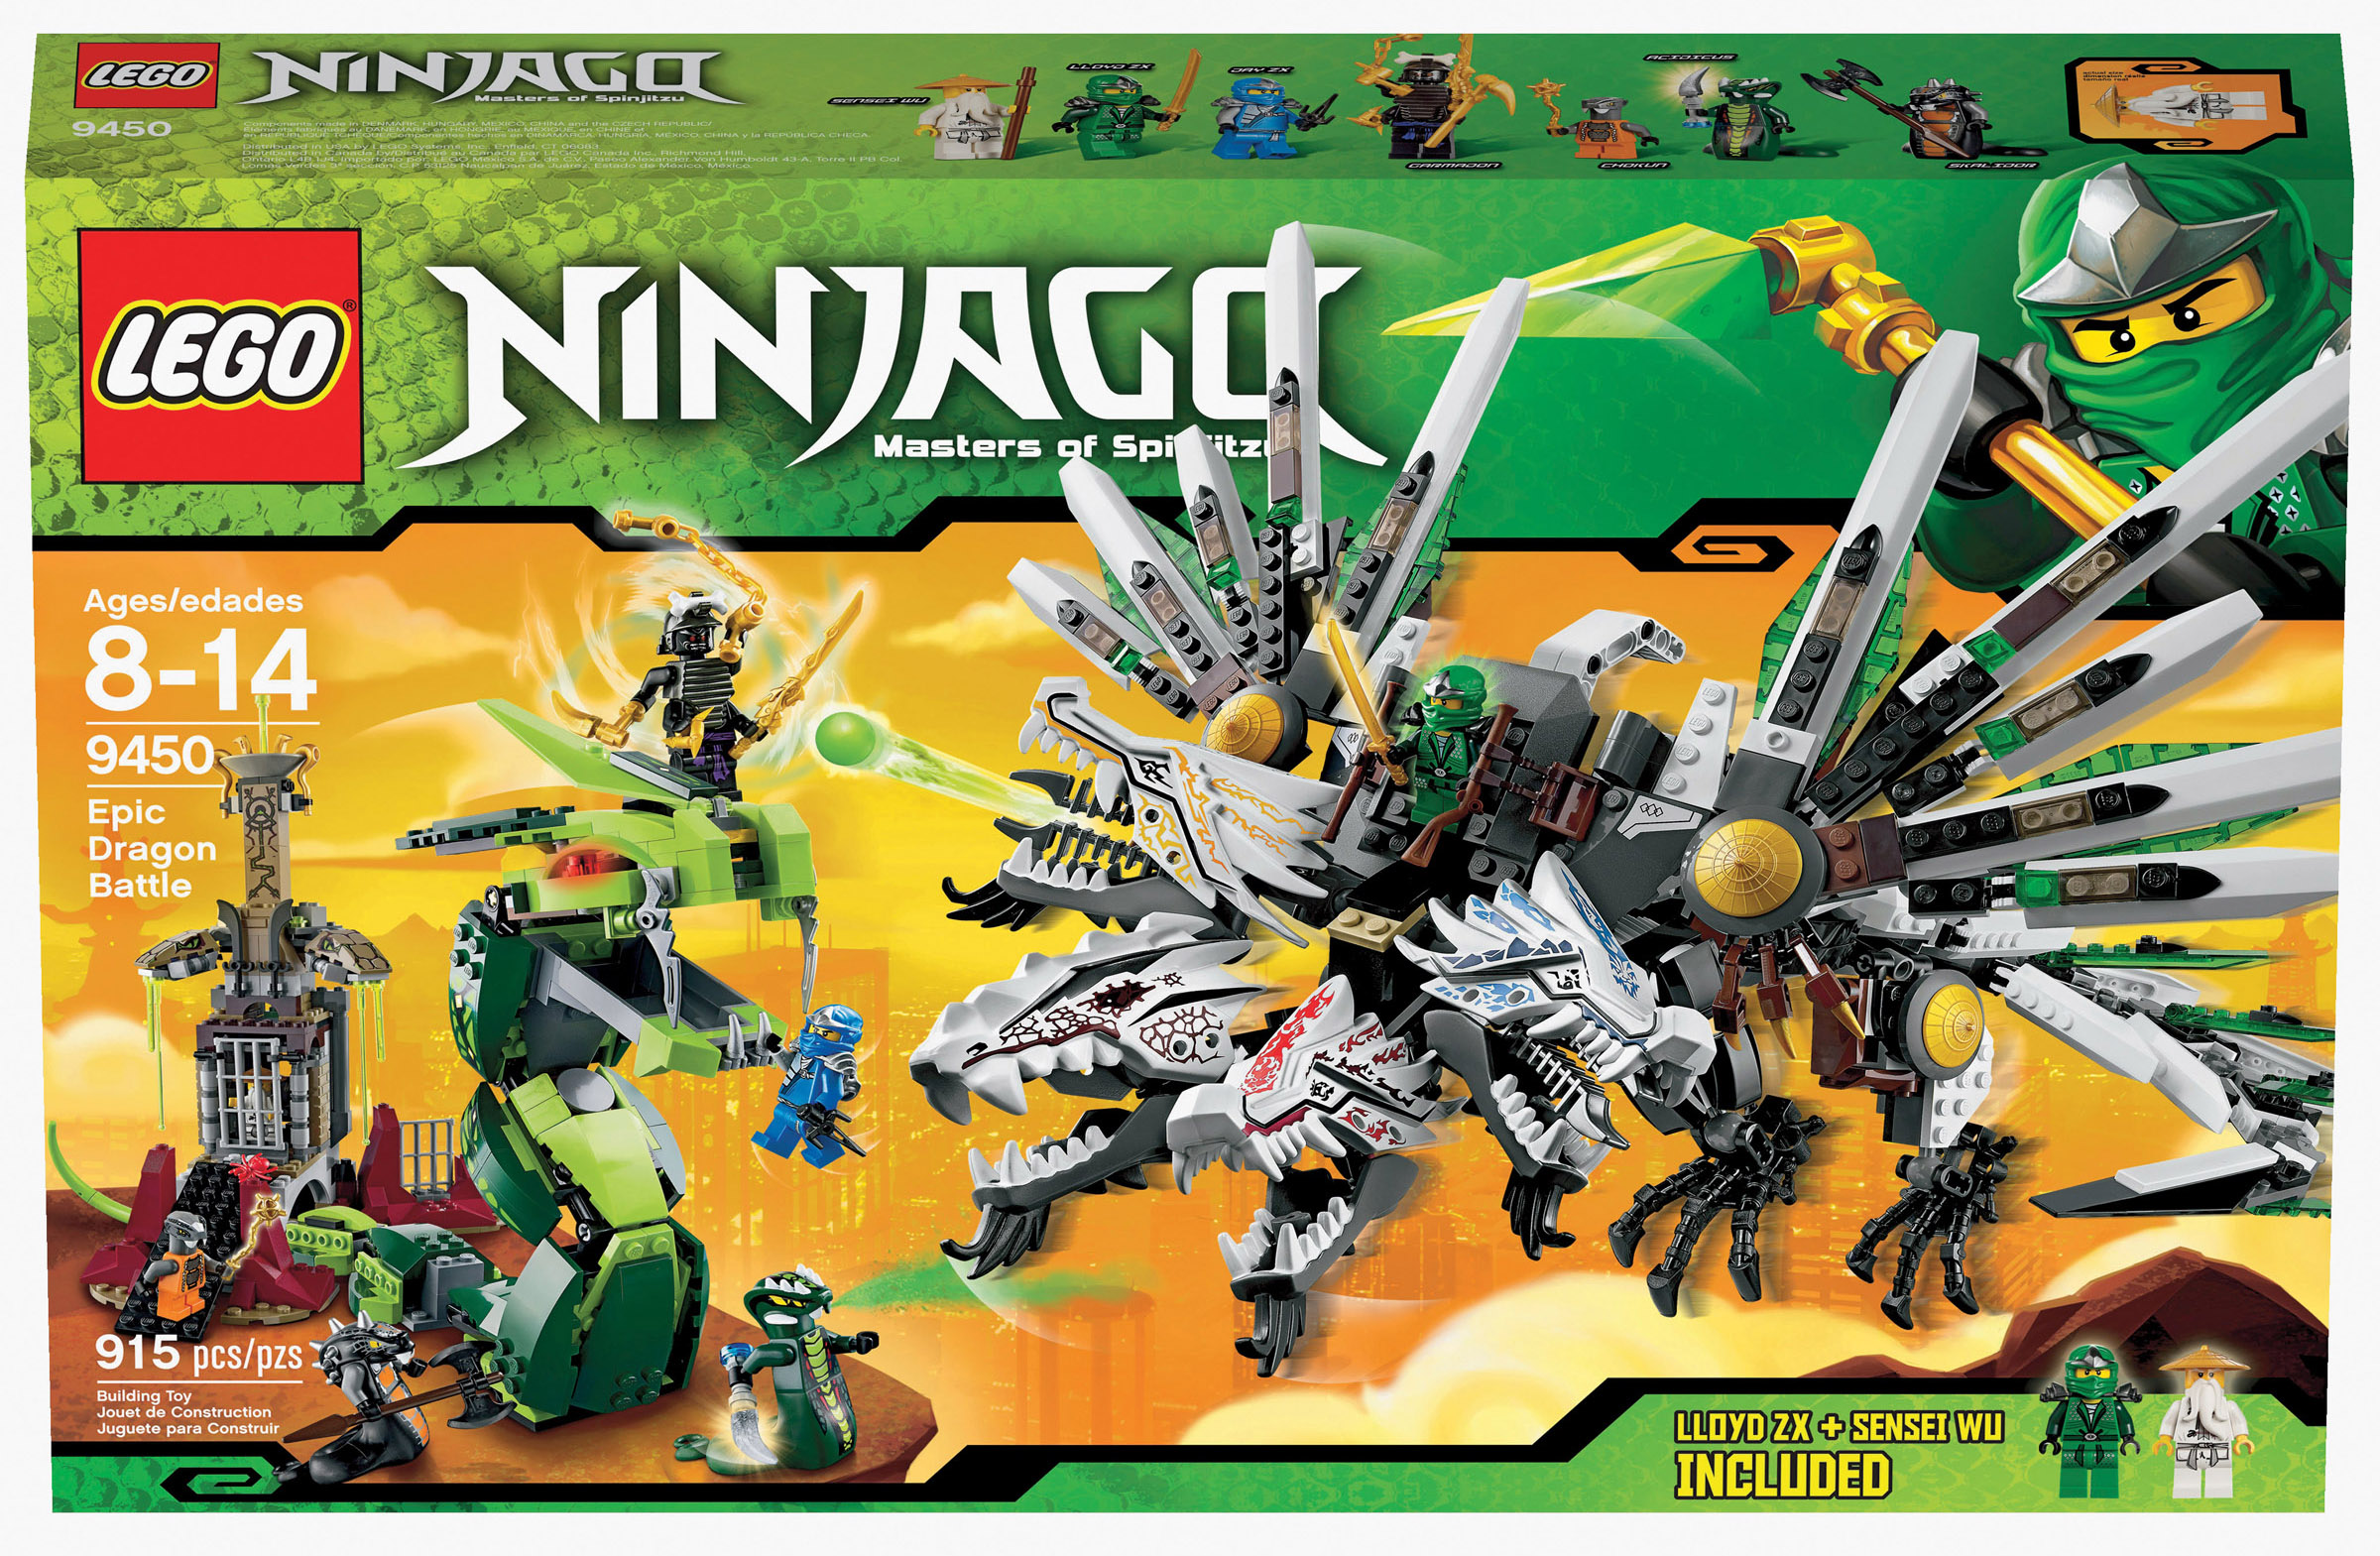 Lego Ninjago Toys : Toystop